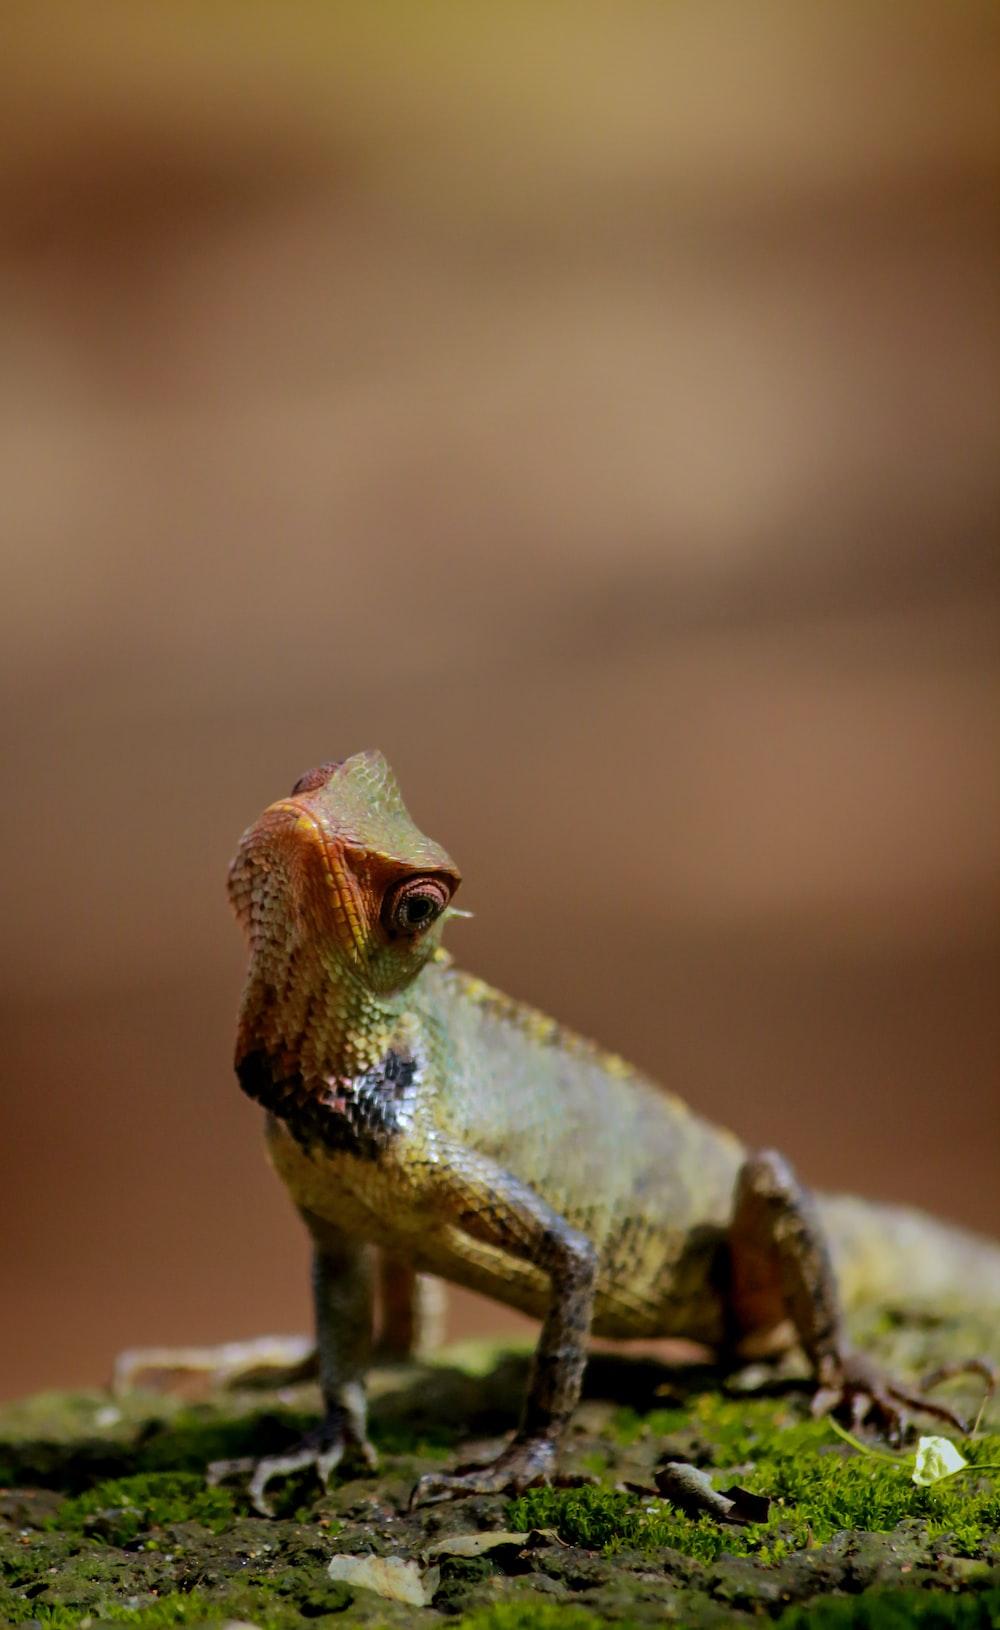 shallow focus photo of reptile